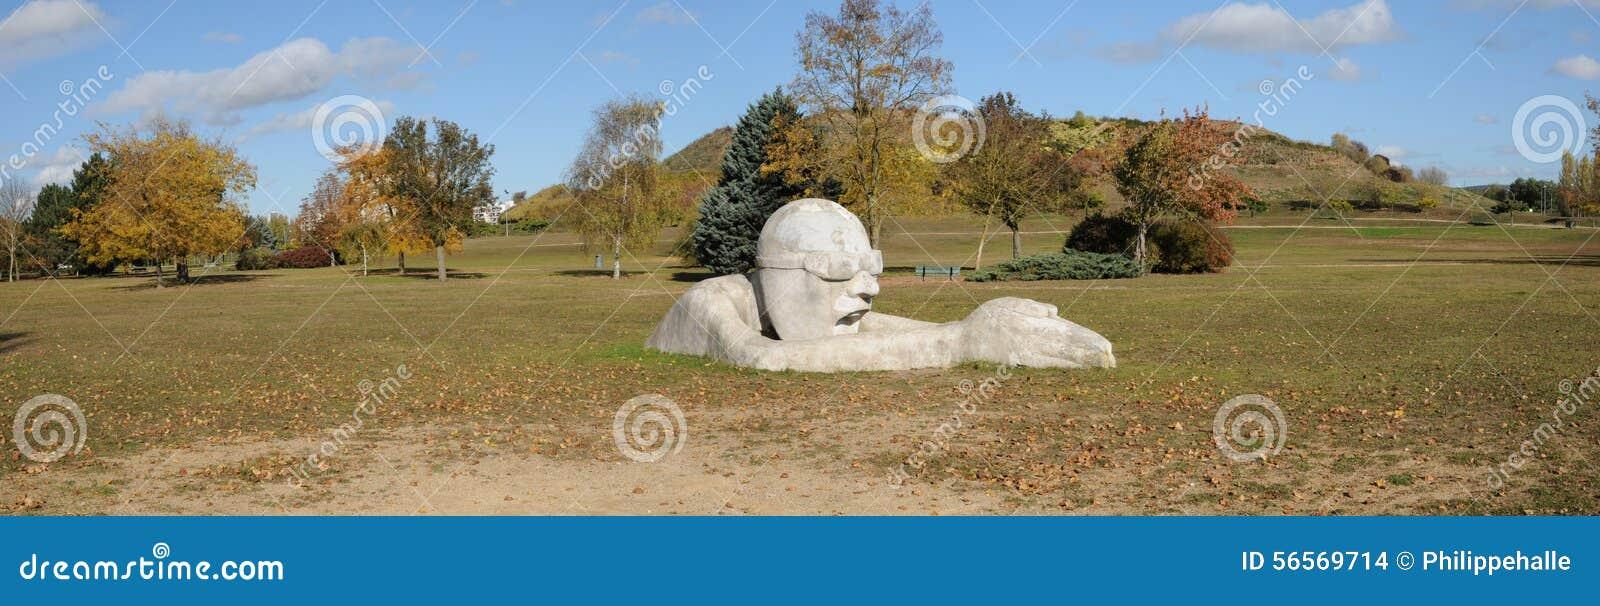 Download Γαλλία, πάρκο Sautour σε Les Mureaux Εκδοτική Στοκ Εικόνα - εικόνα από γαλλία, εξωτερικό: 56569714